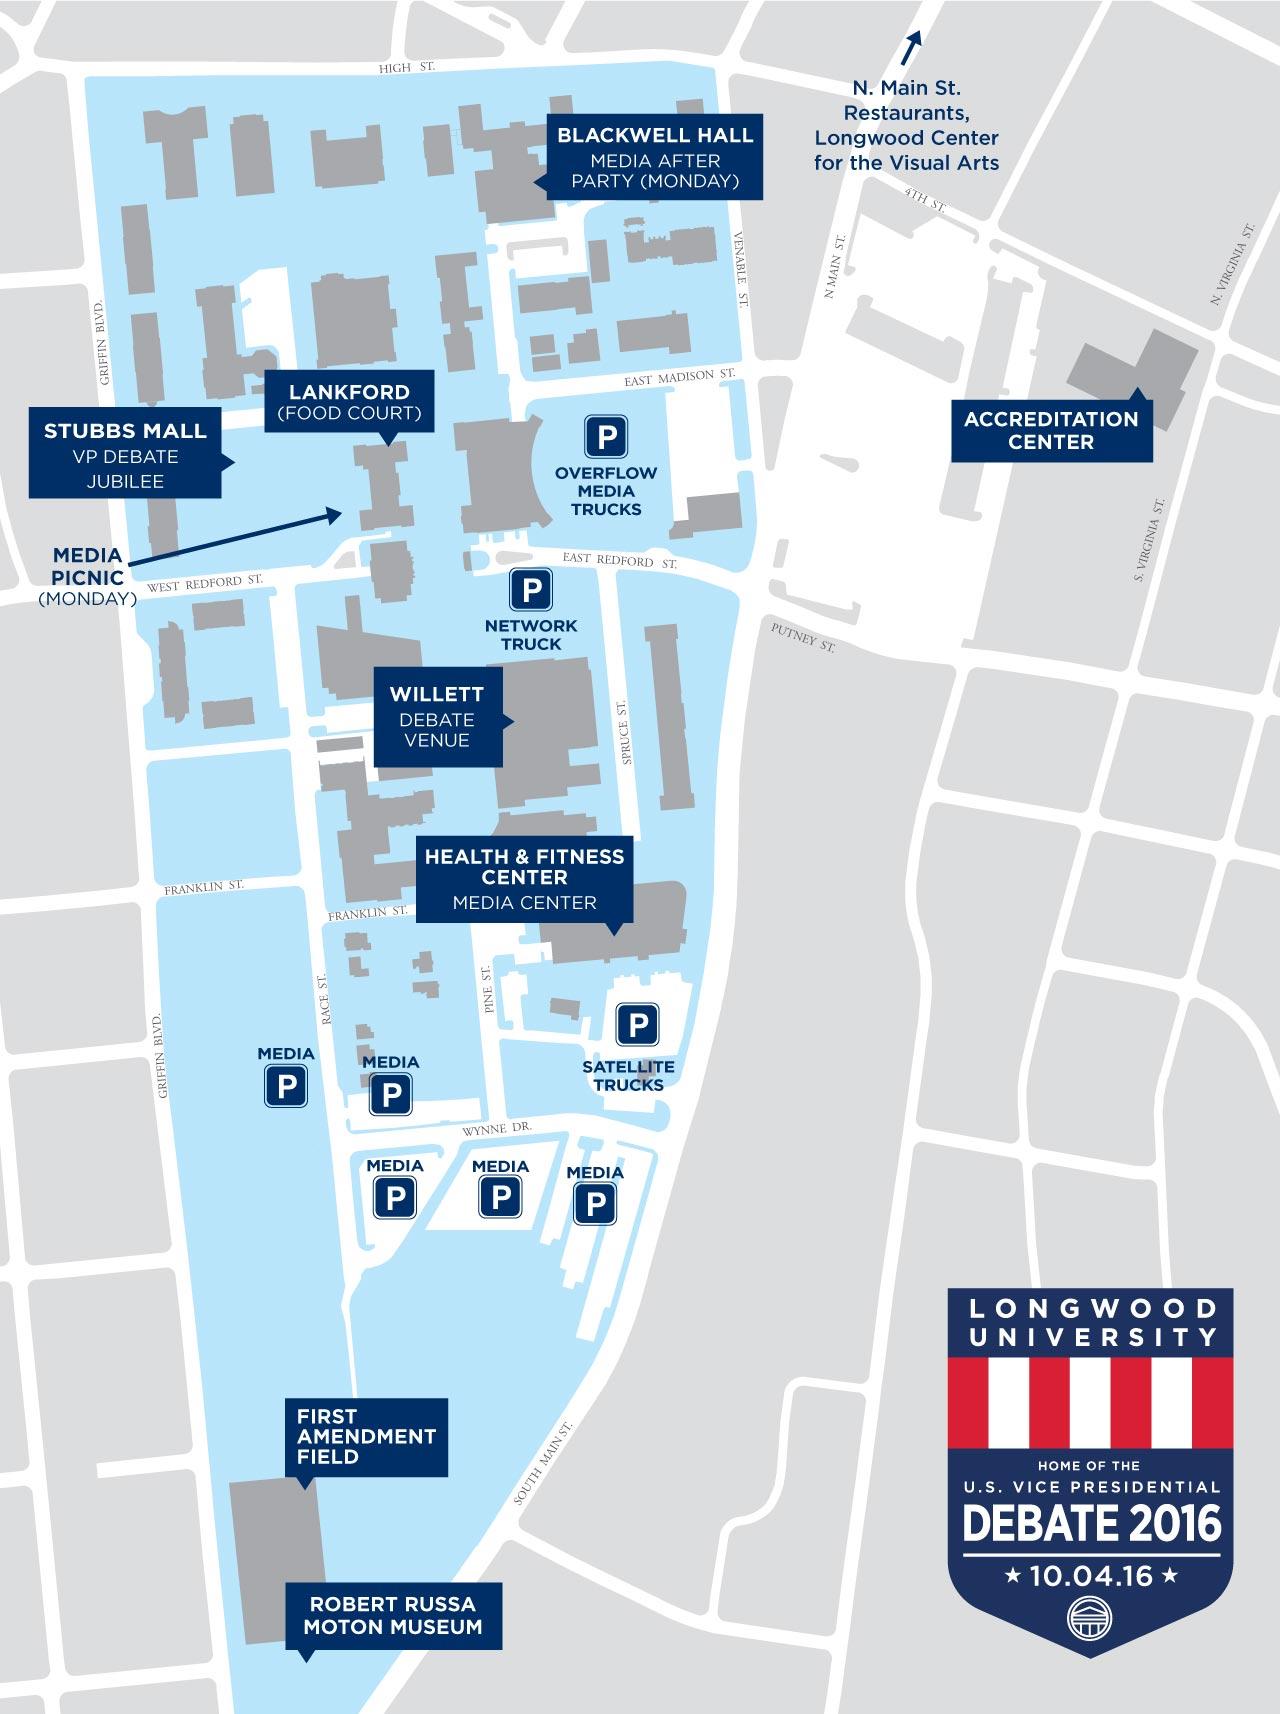 longwood university campus map 2016 Vice Presidential Debate At Longwood longwood university campus map